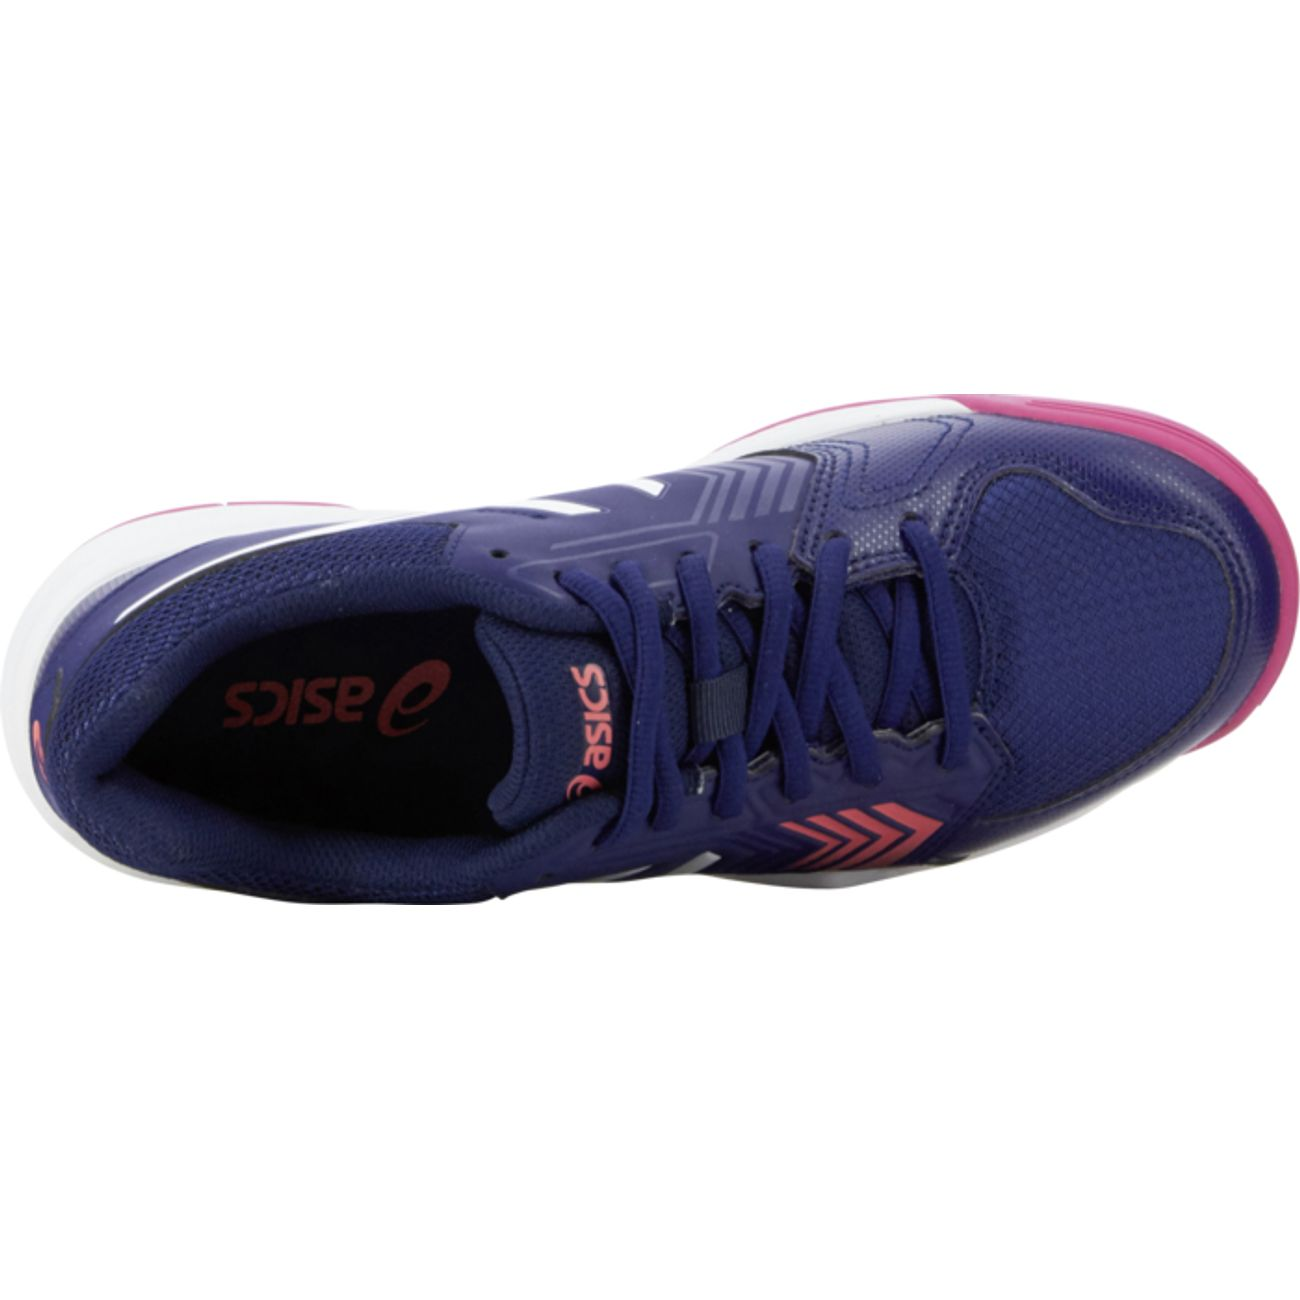 new style 5a23a 833cb ... Chaussures tennis Tennis ASICS GEL DEDICATE 5 ...